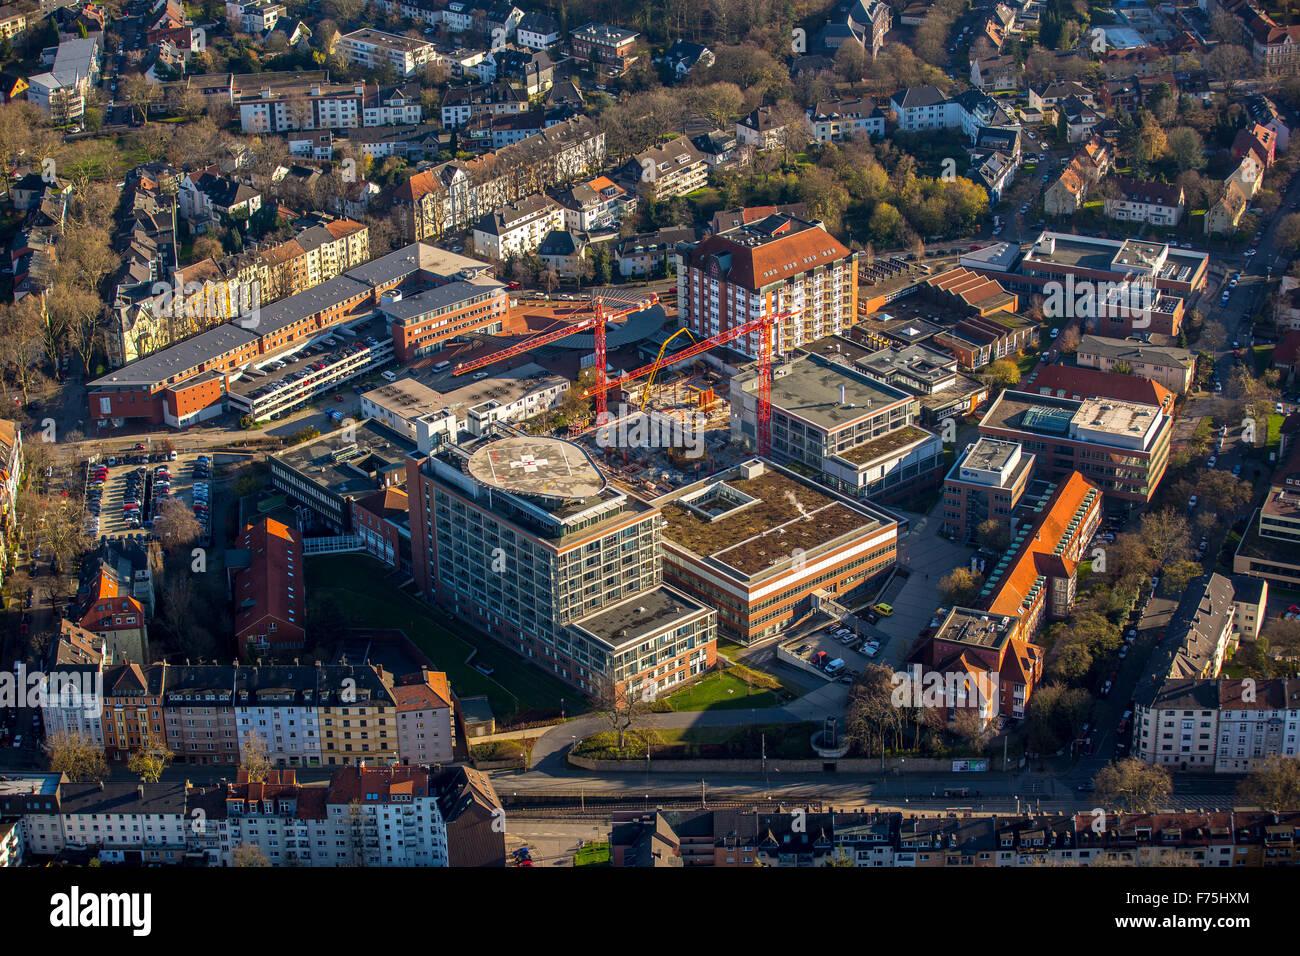 Construction work at the University Hospital Bergmannsheil Bochum, Bochum, Ruhr area, North Rhine-Westphalia, Germany, Stock Photo